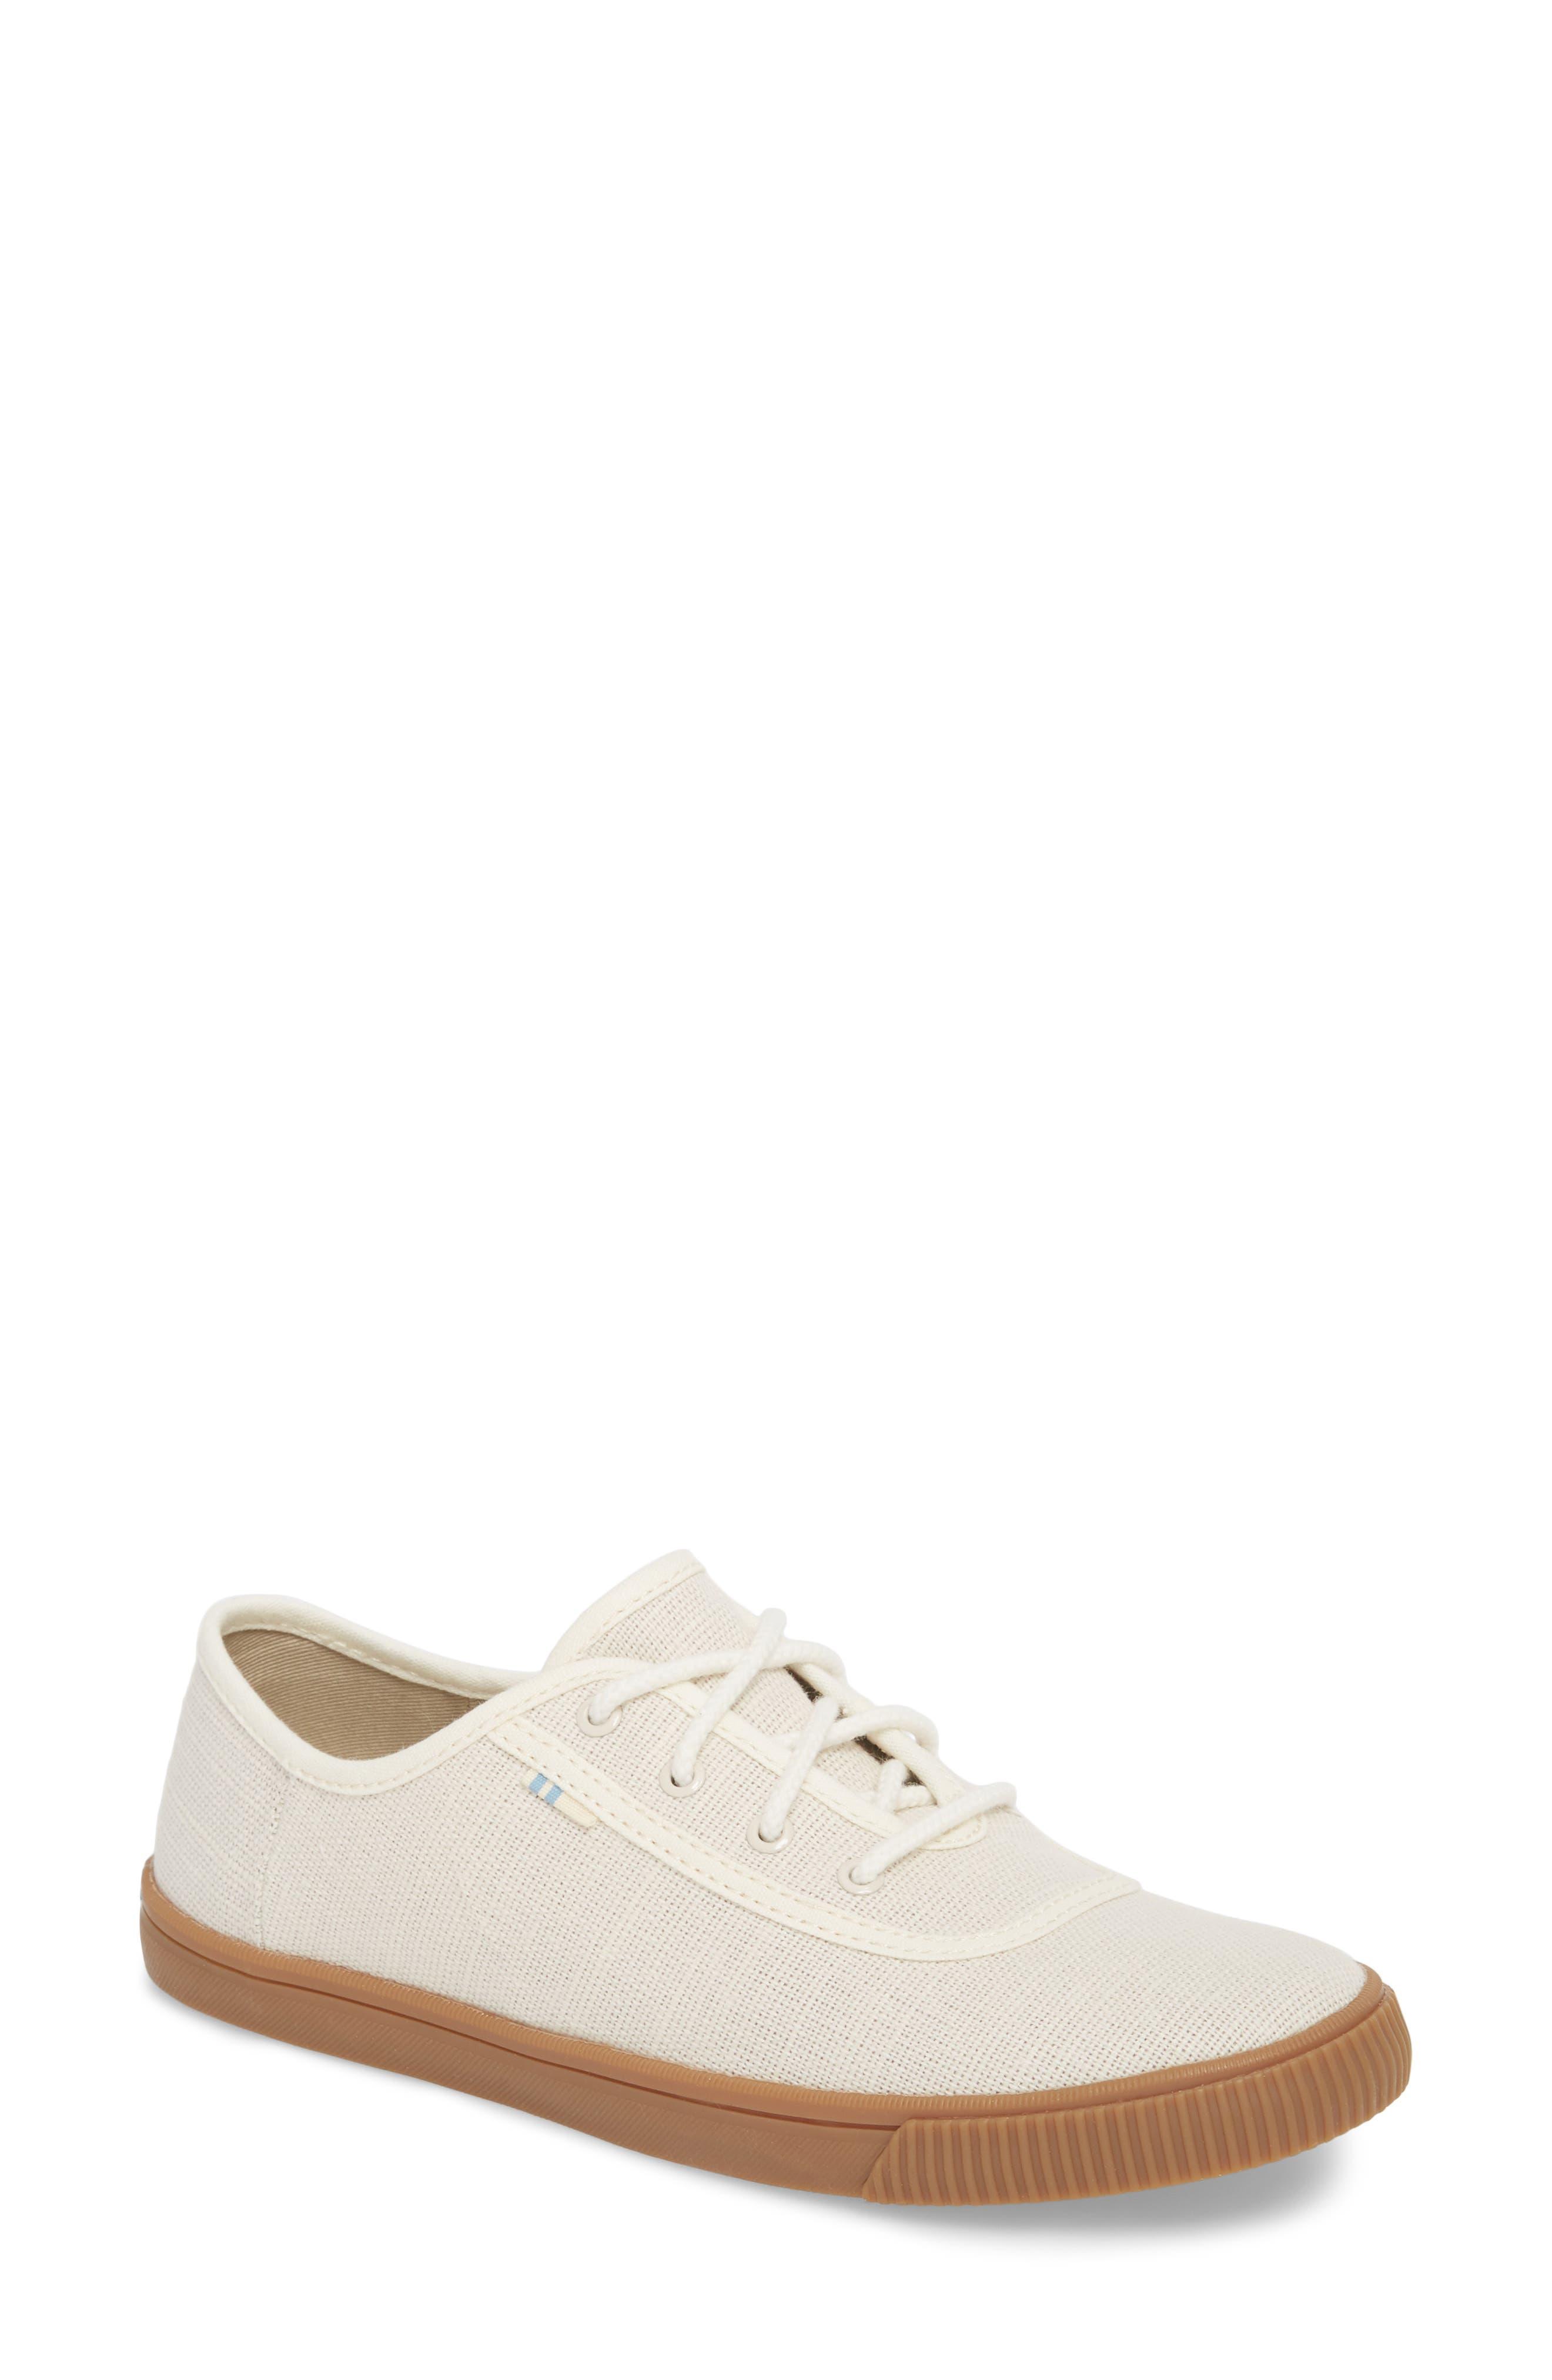 Carmel Sneaker,                         Main,                         color, BIRCH HERITAGE CANVAS